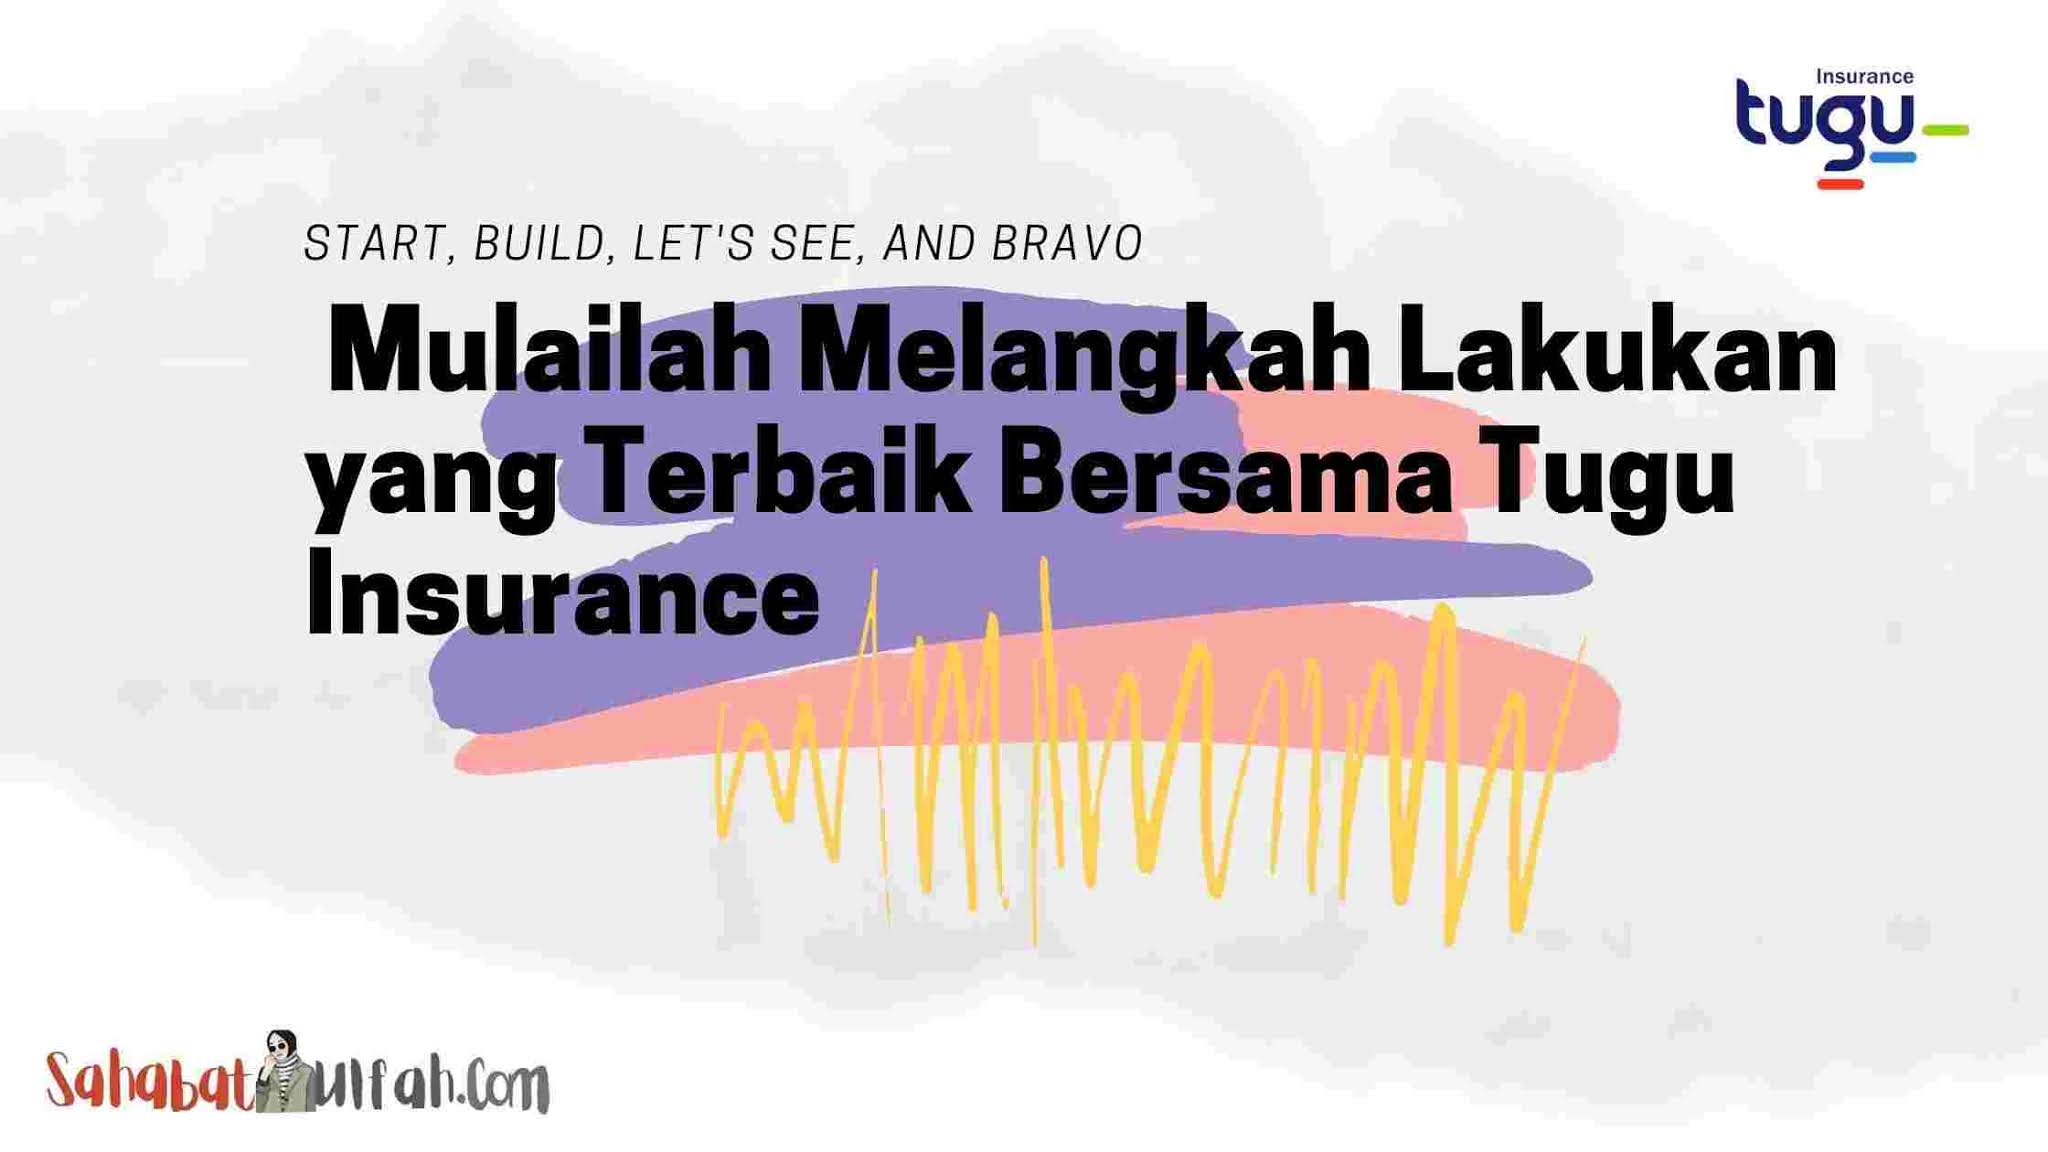 Mulailah Melangkah Lakukan yang Terbaik Bersama Tugu Insurance